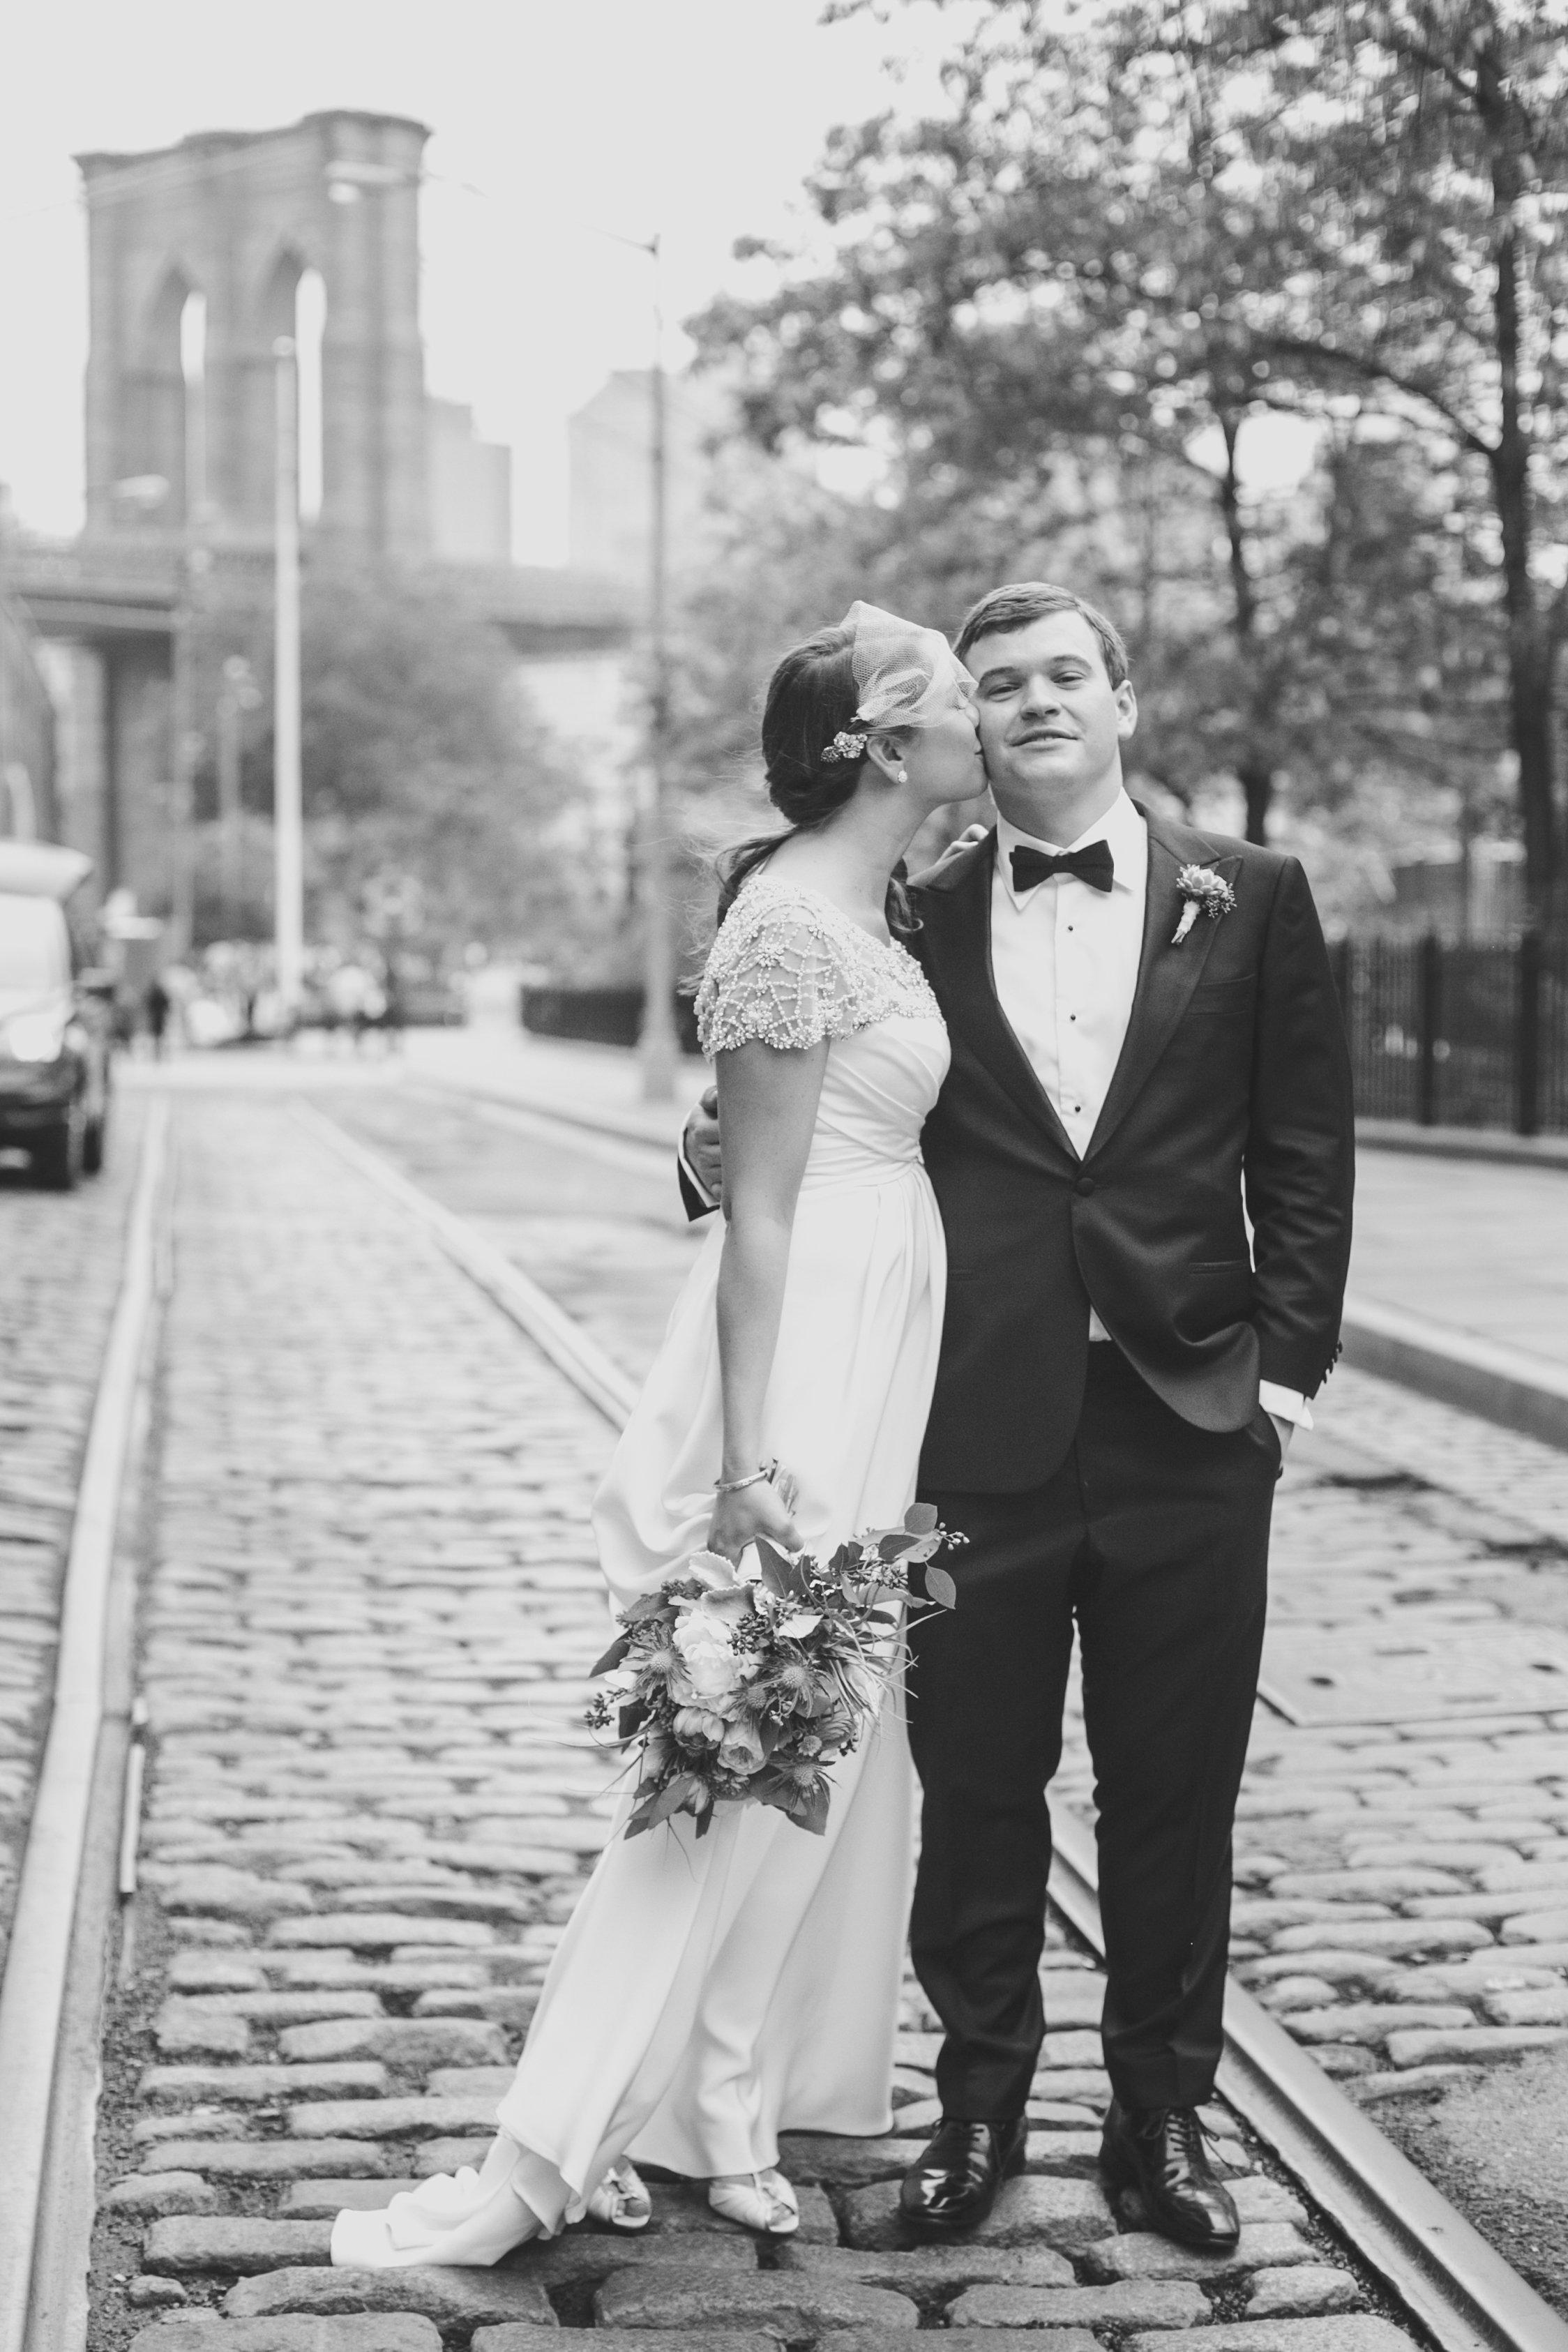 Elise and Dan s Wedding-Photographers Favorites-0091.jpg